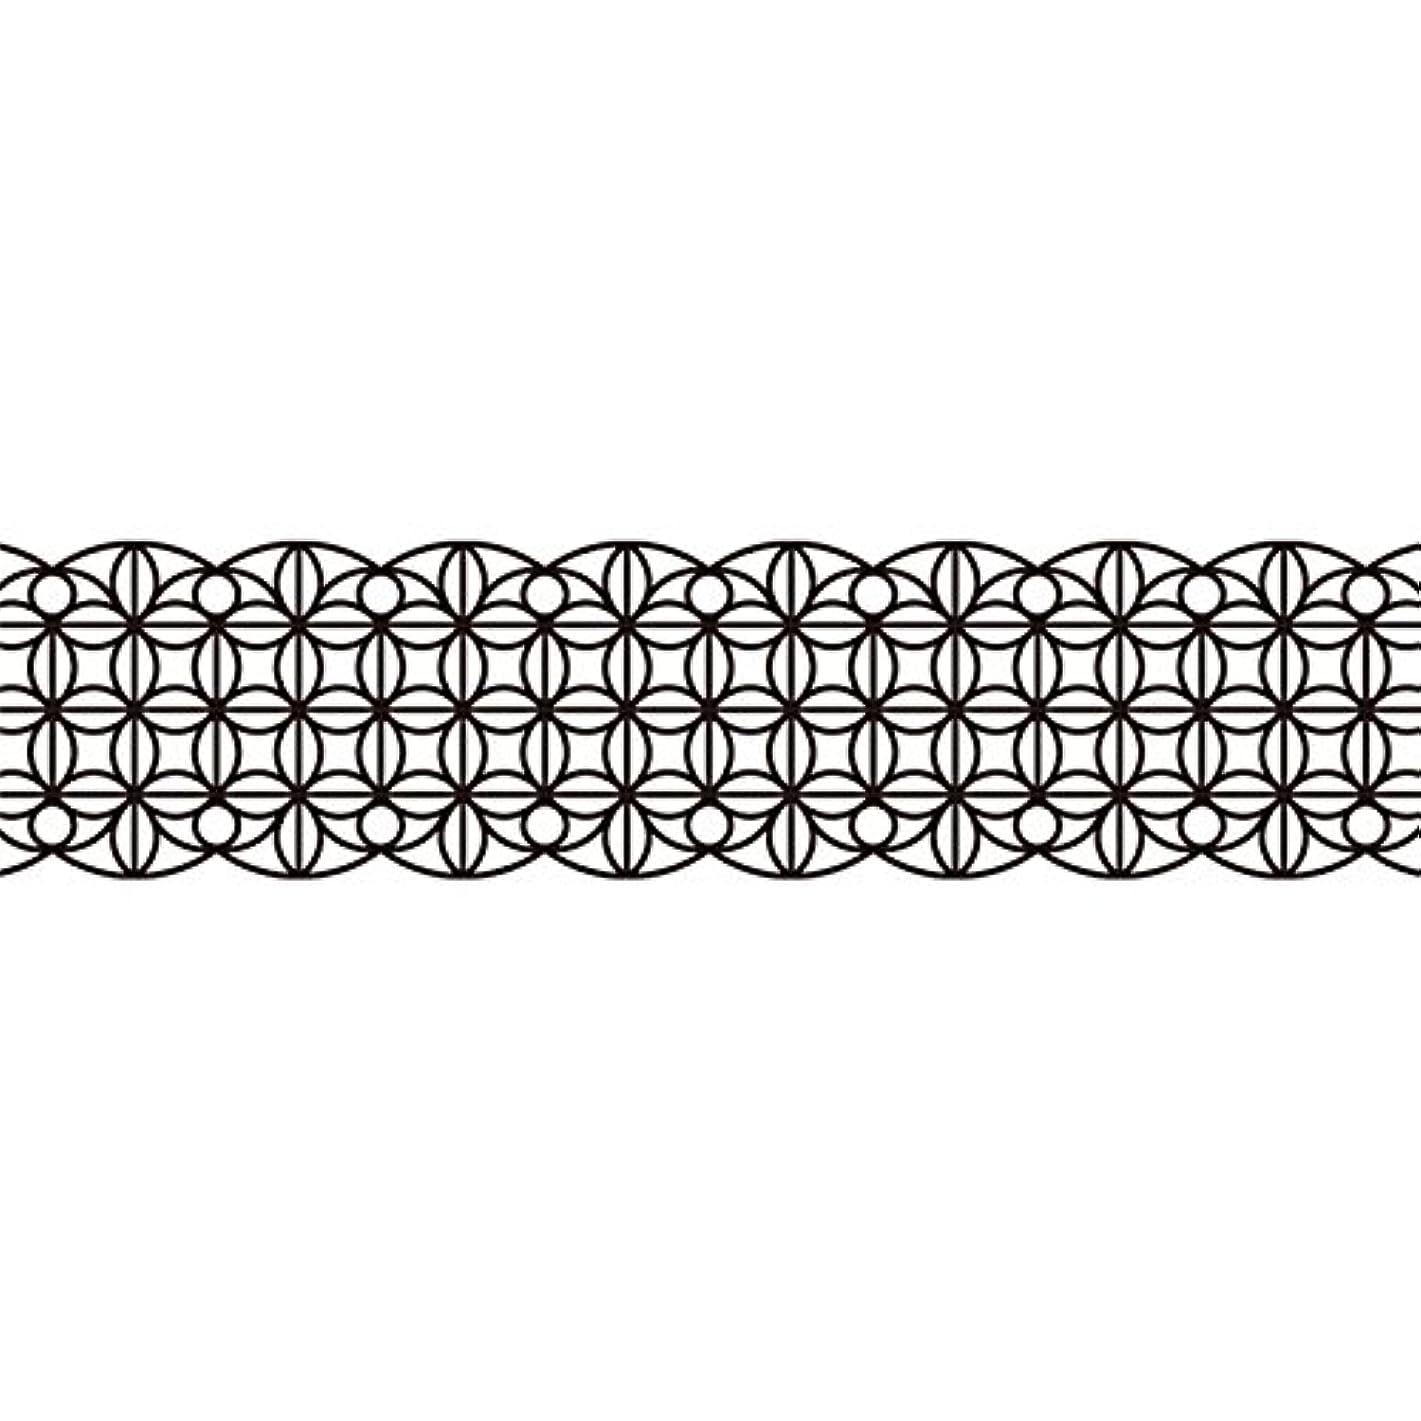 Karen Foster Design Black Leaf, 3-Inch Washi Die-Cut Pavilio Lace Tape,